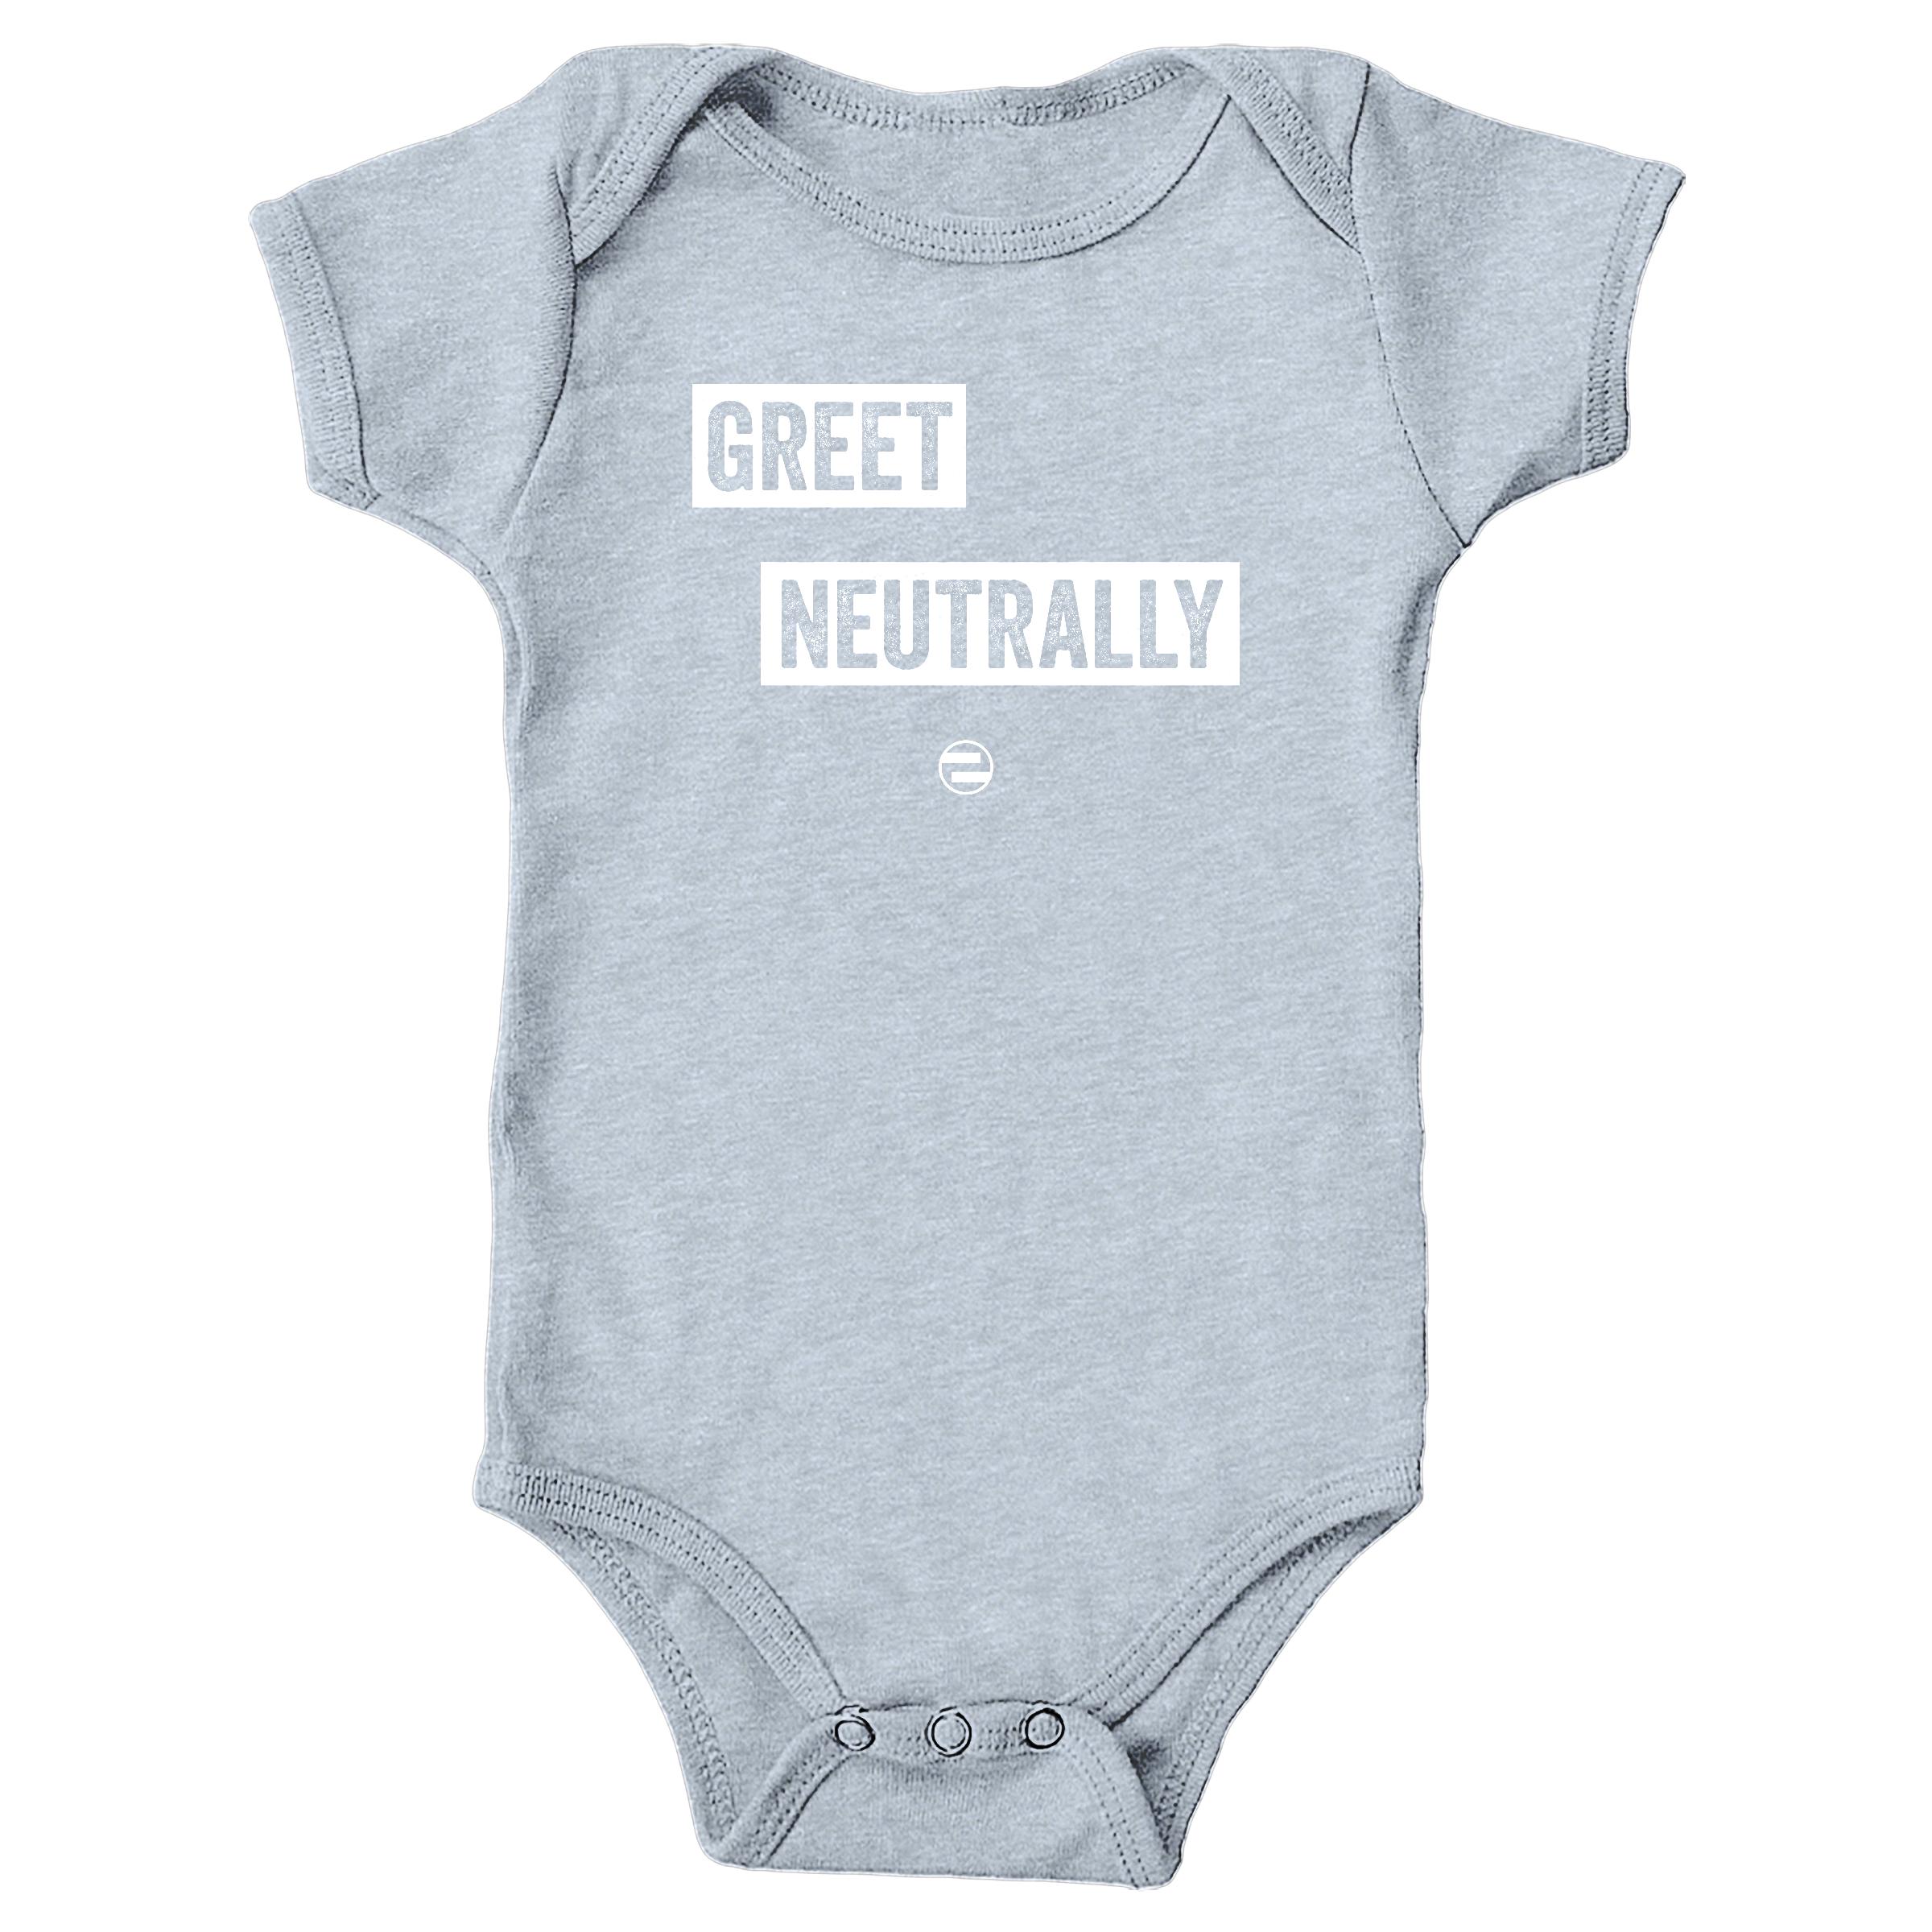 "GenEquality ""Greet Neutrally"" Kids Tee & Onesie Heather Grey (Onesie)"